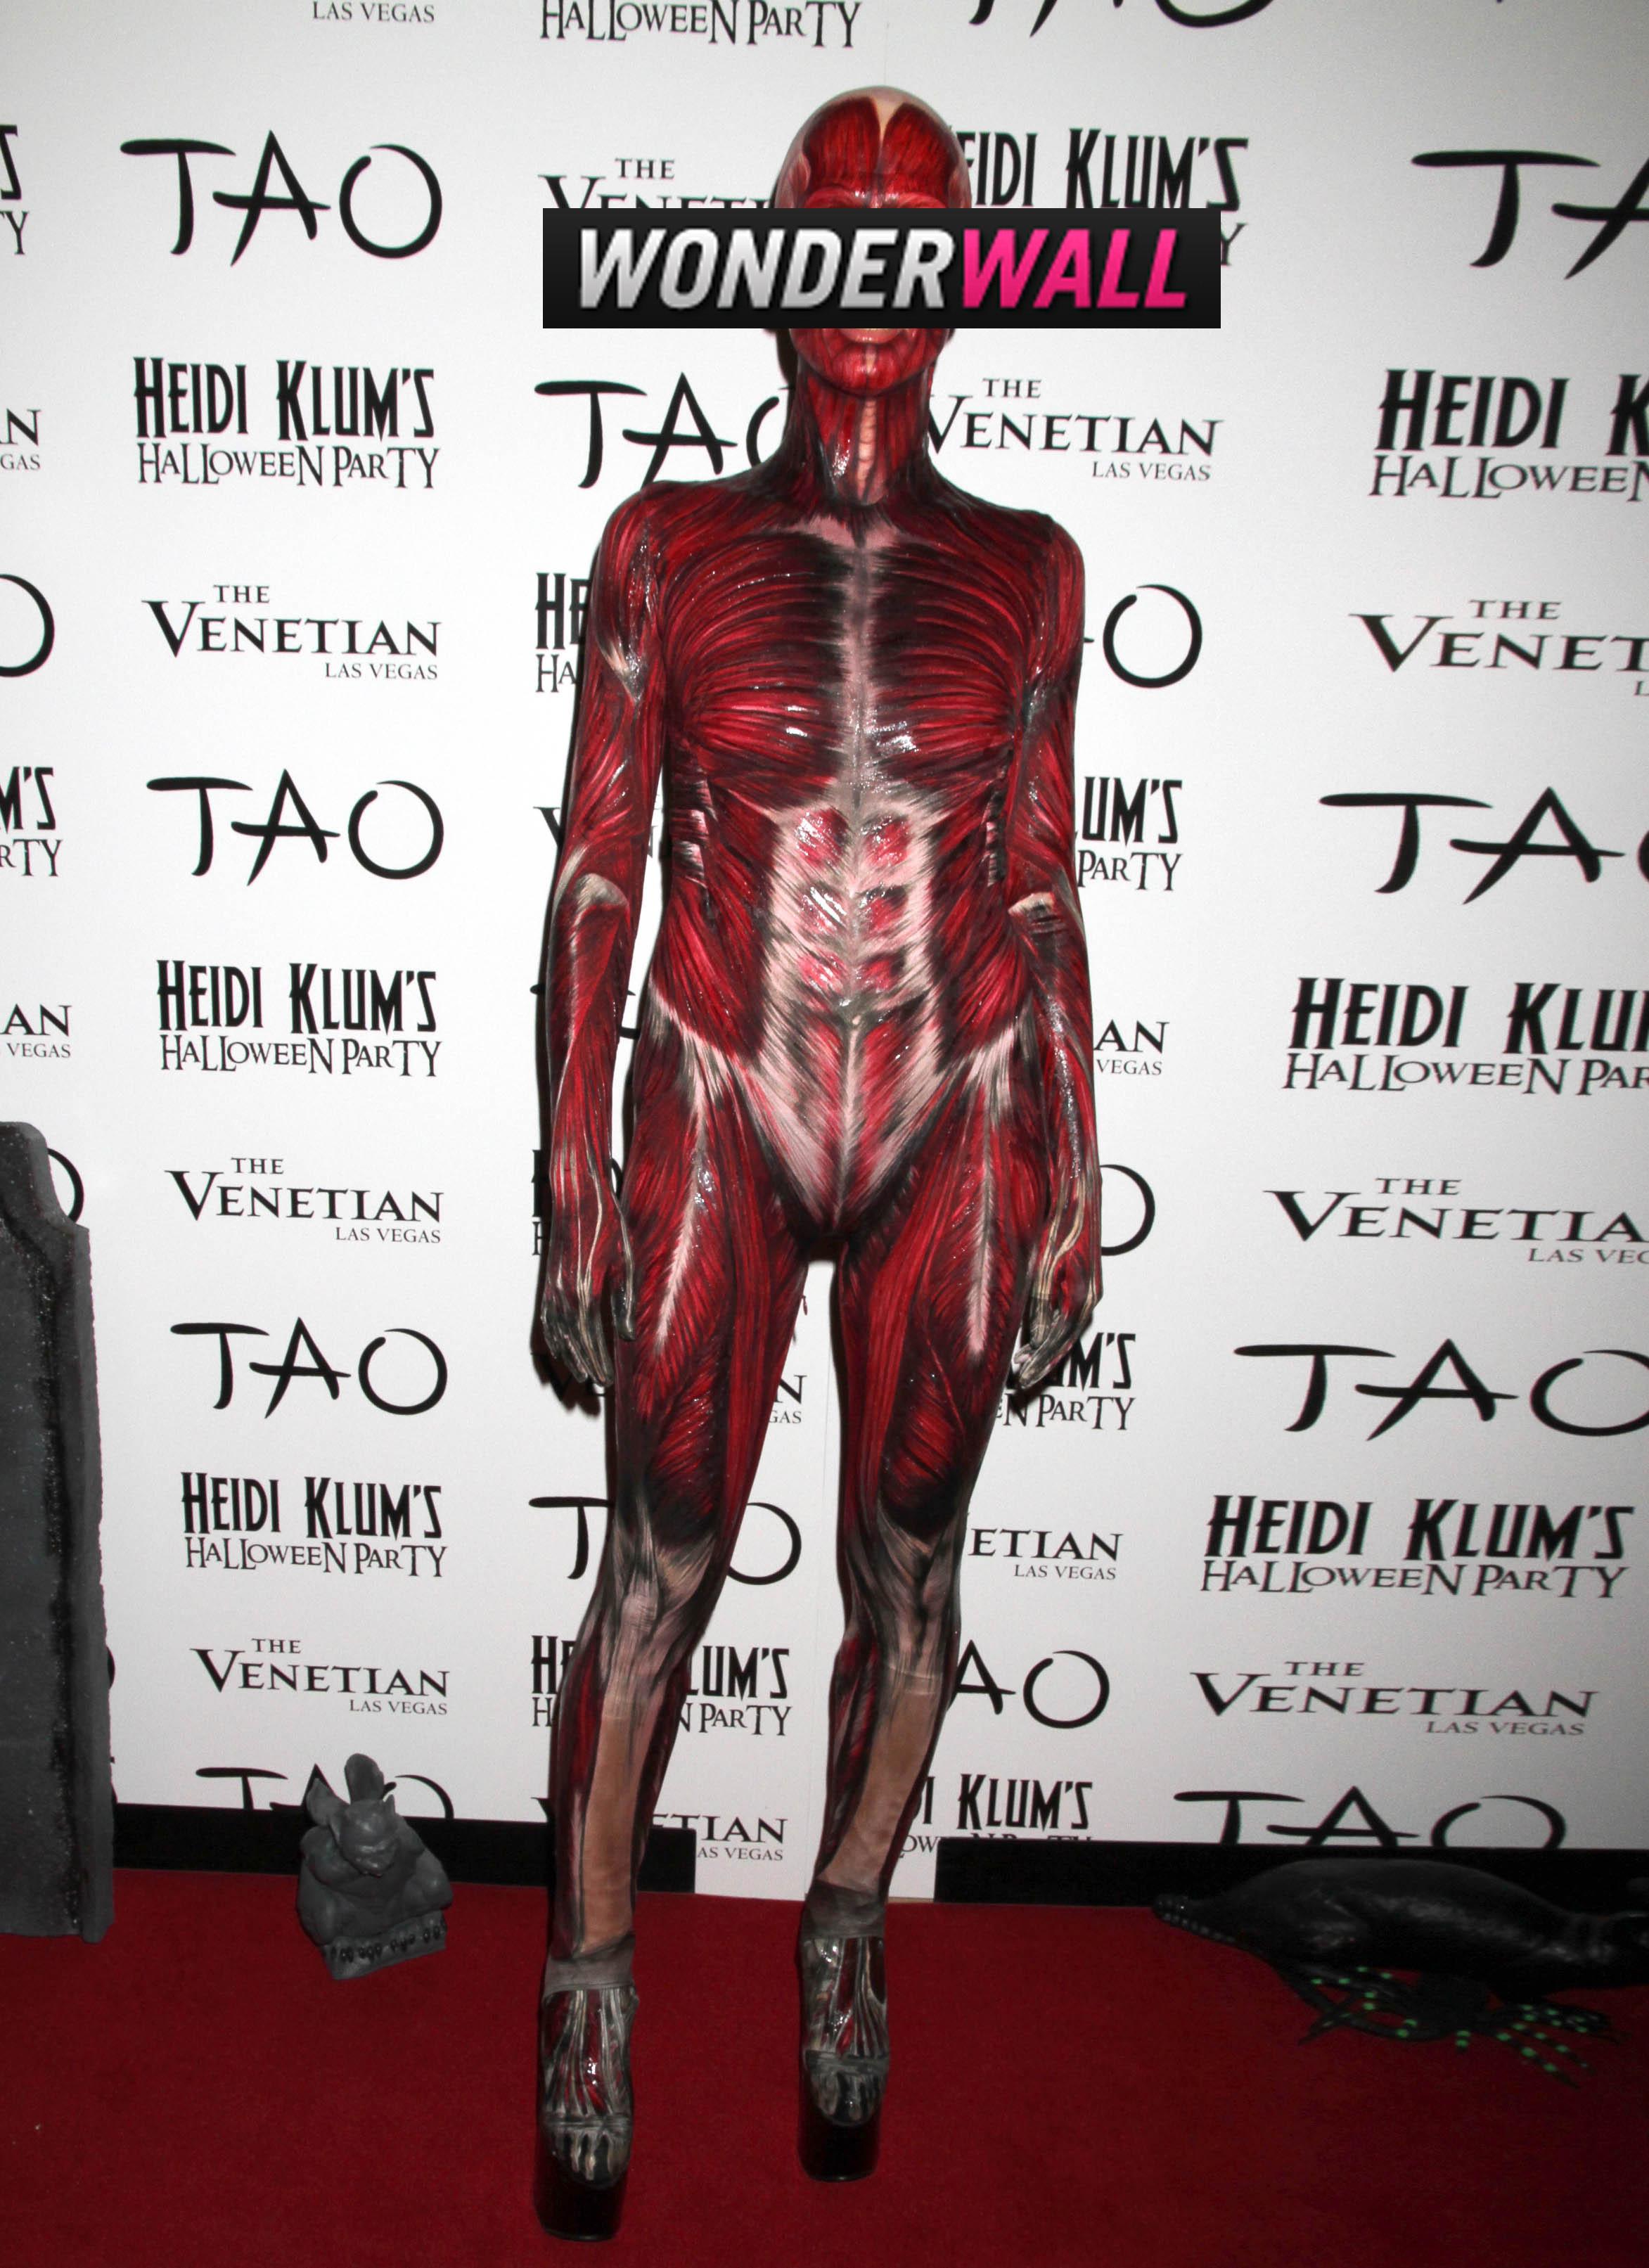 Heidi Klum human being